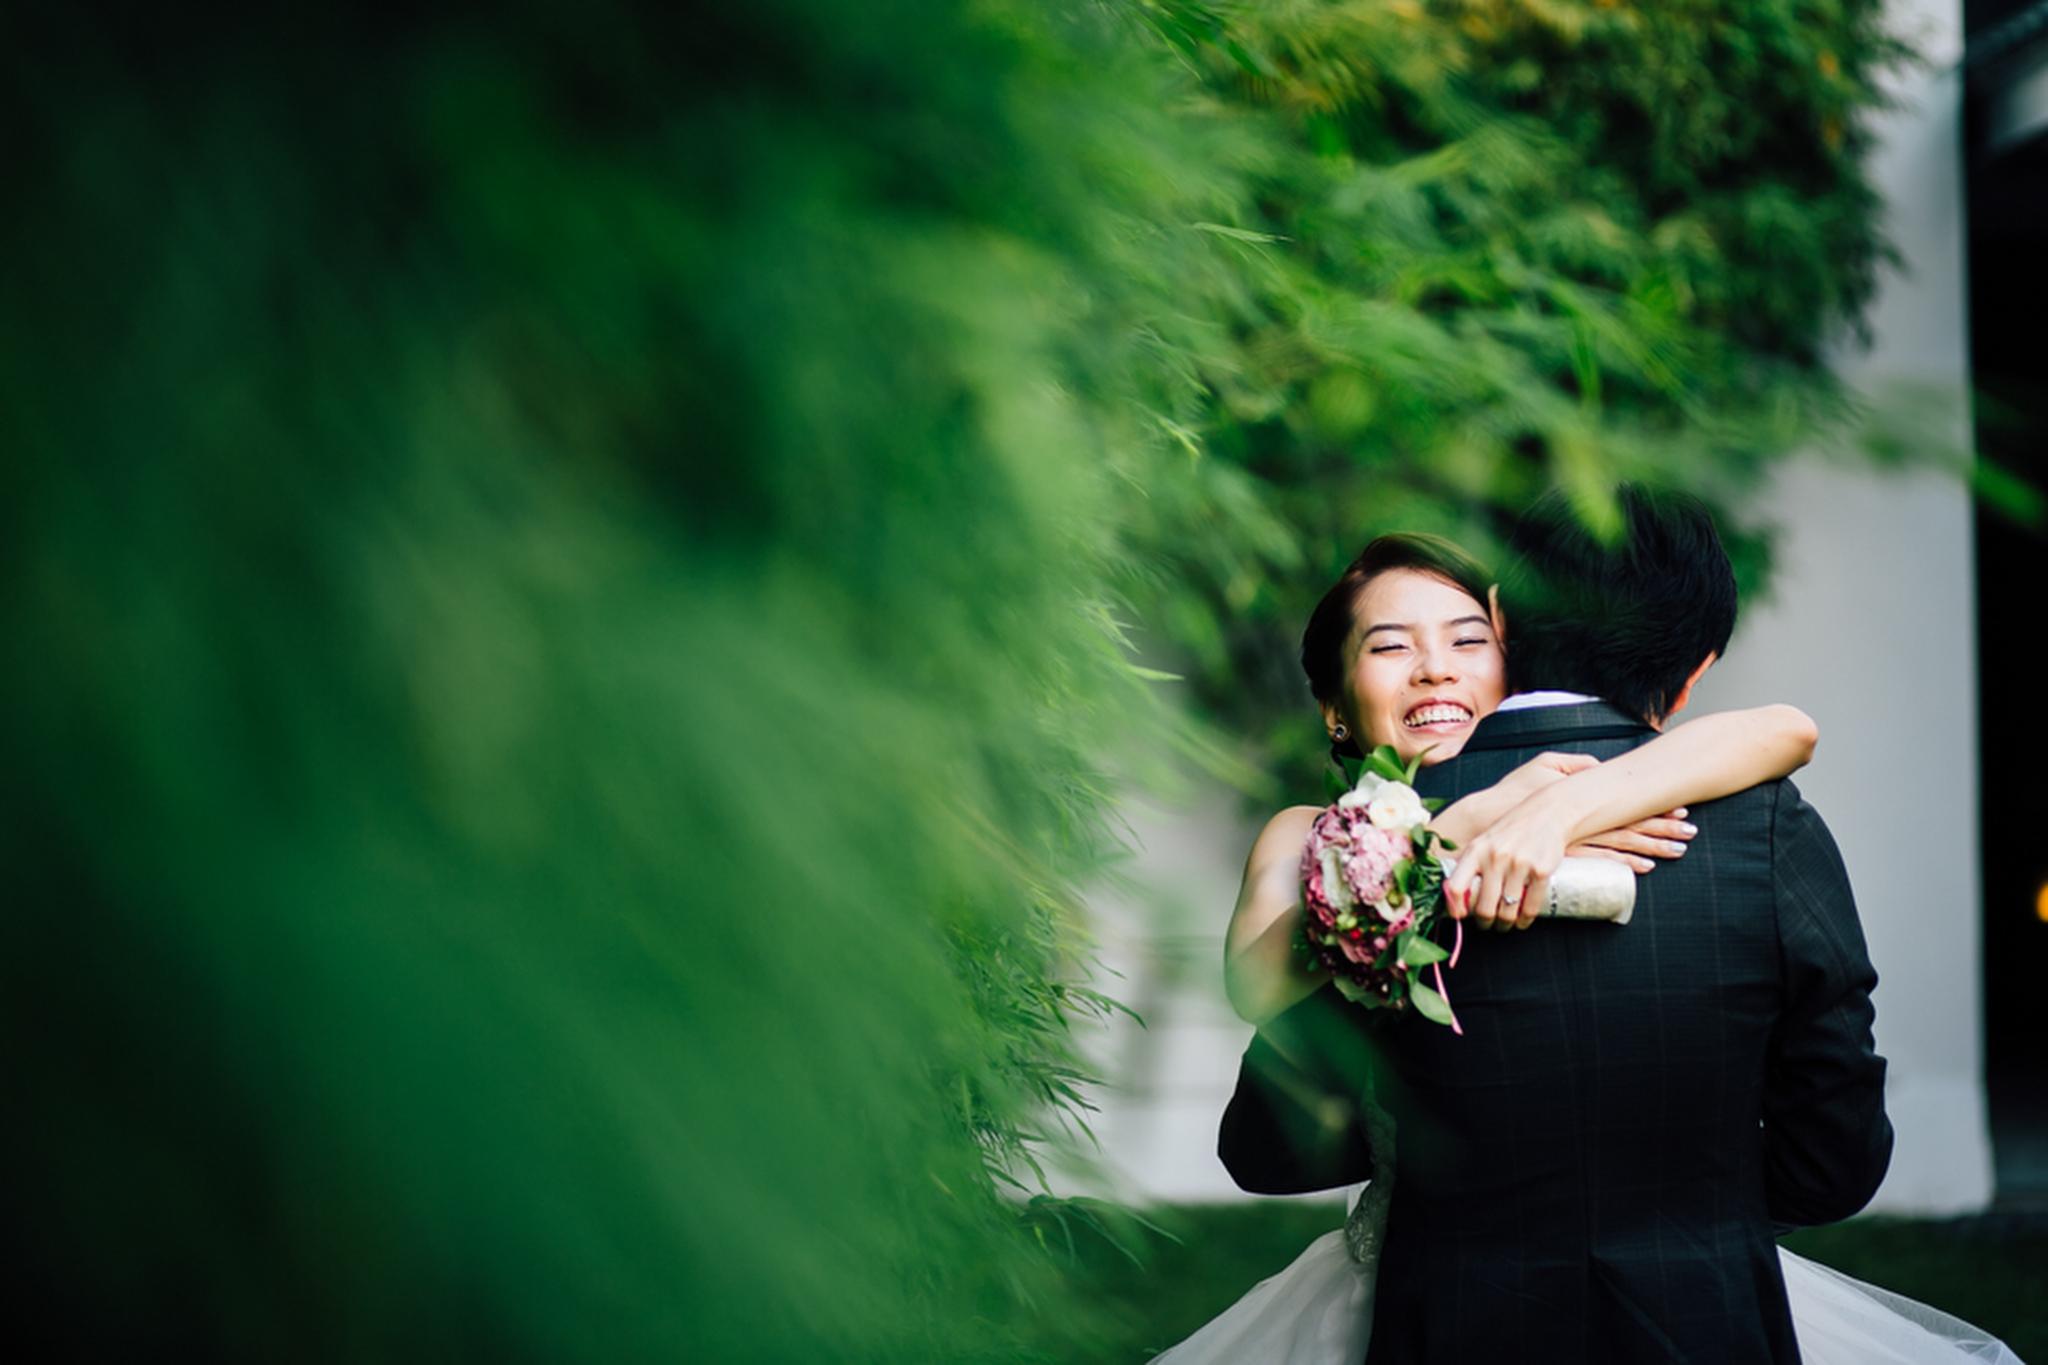 Singapore Wedding Photographer - Joey & Amily Wedding Day (80 of 154).JPG